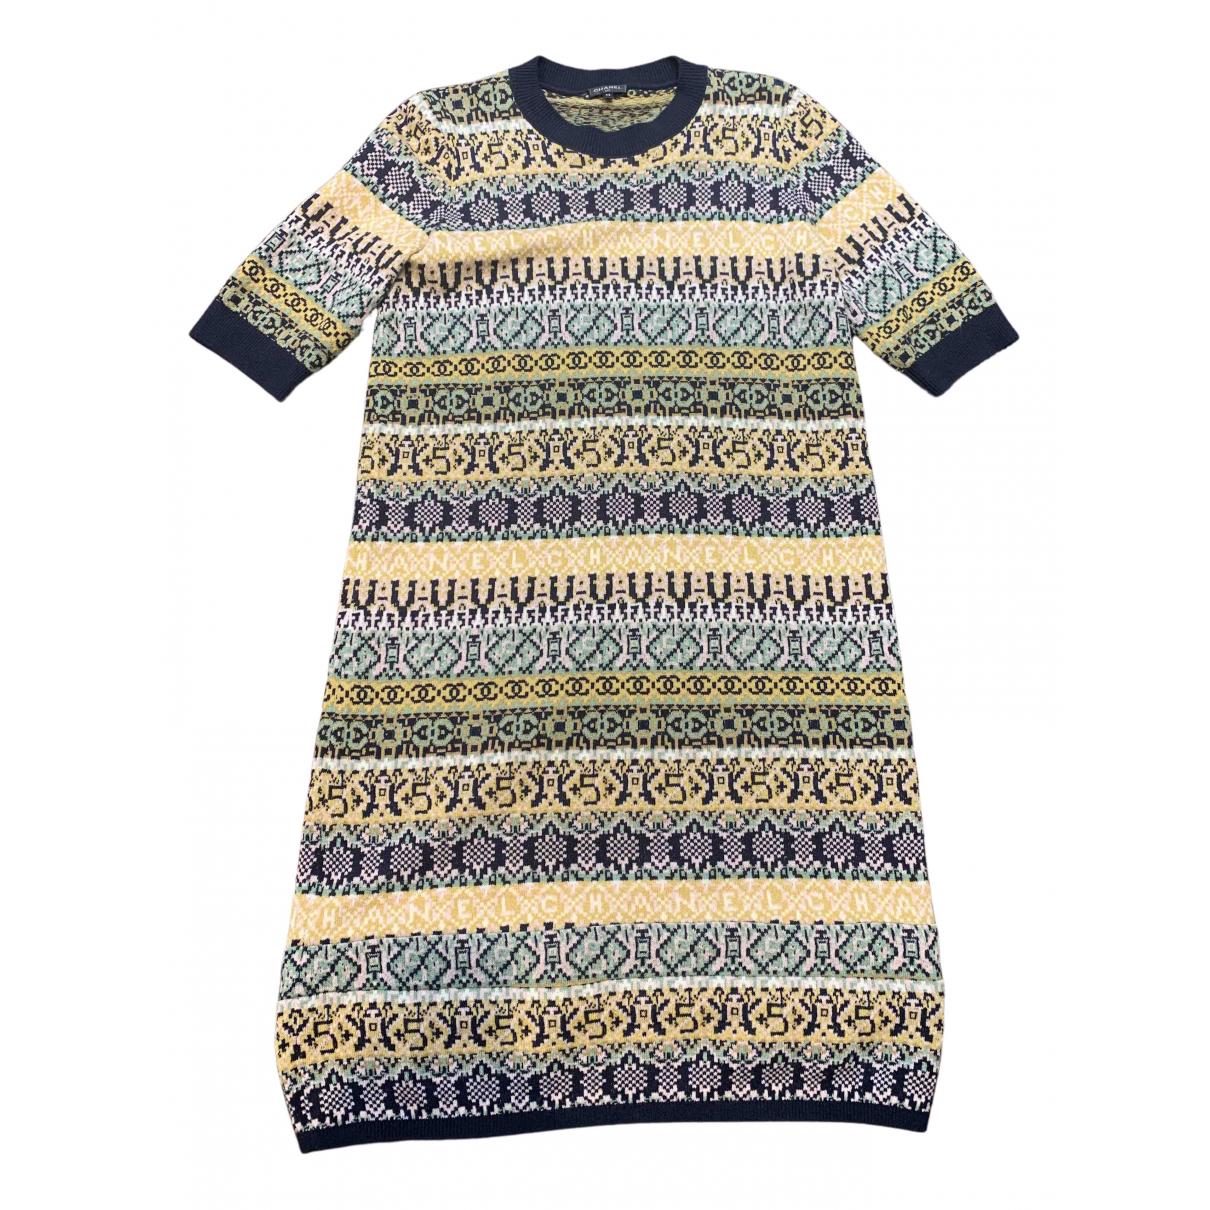 Chanel \N Blue Cashmere dress for Women 42 FR